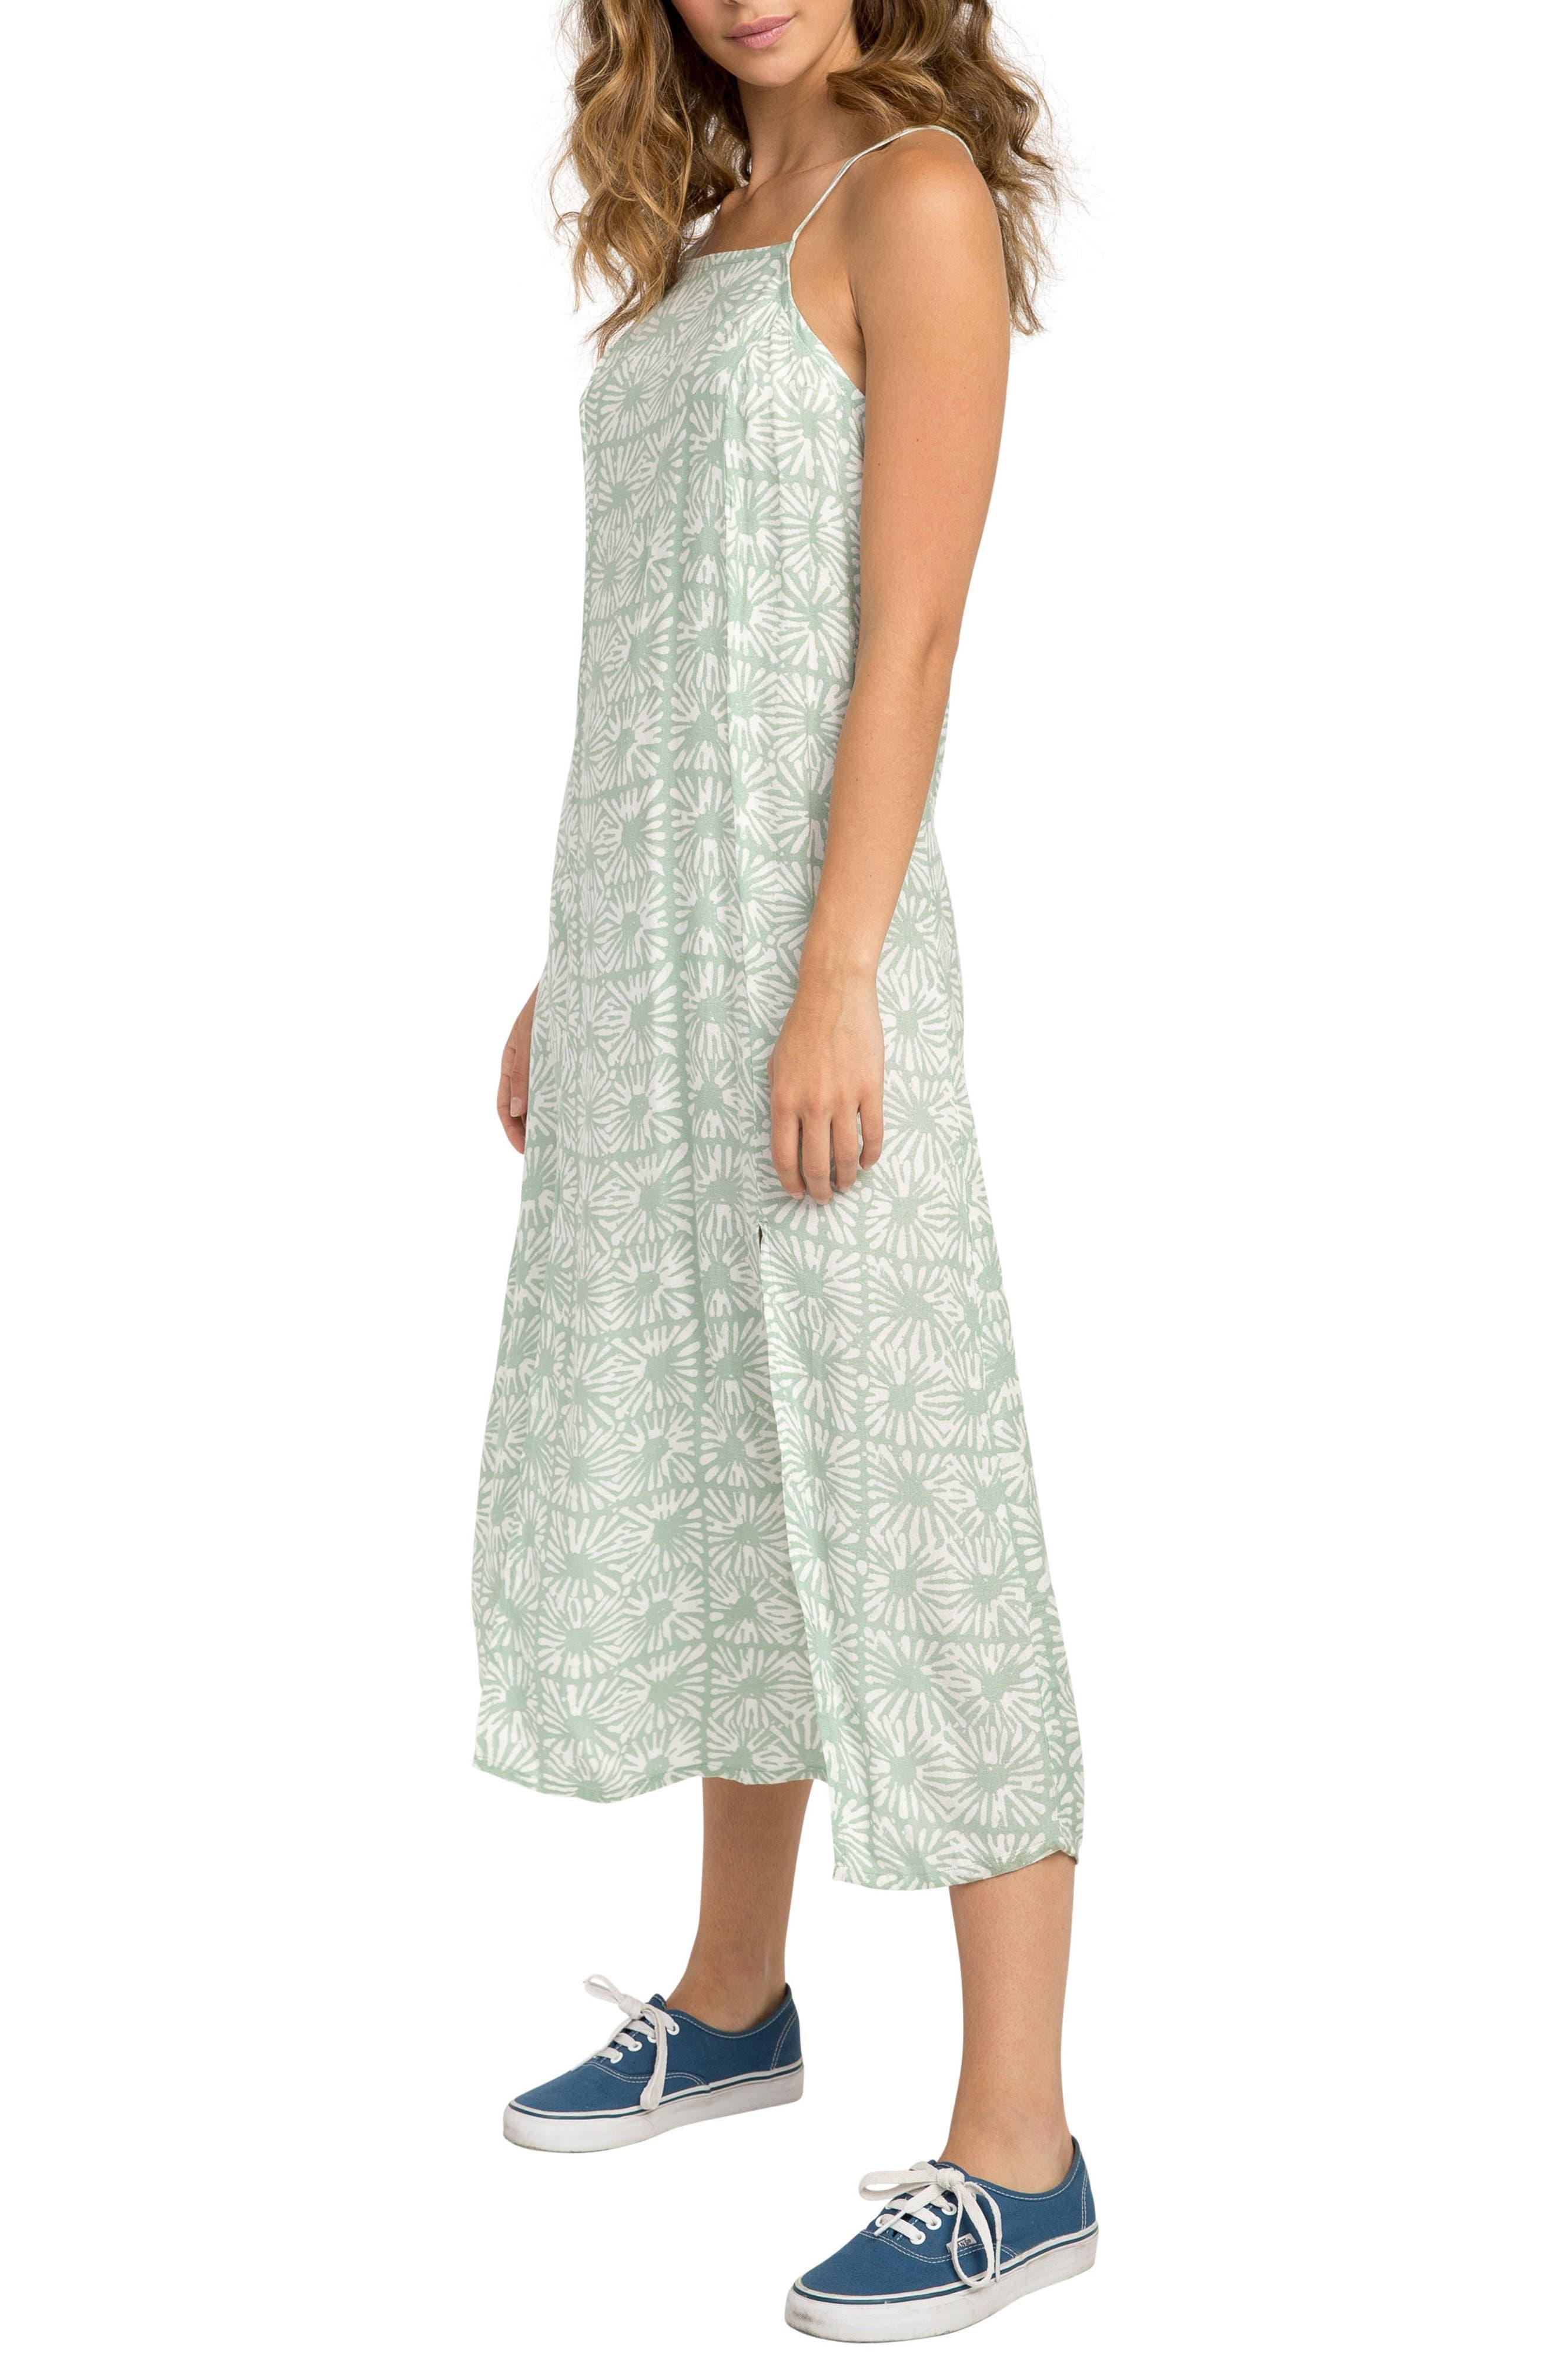 Garland Print Midi Dress,                             Alternate thumbnail 3, color,                             Artichoke